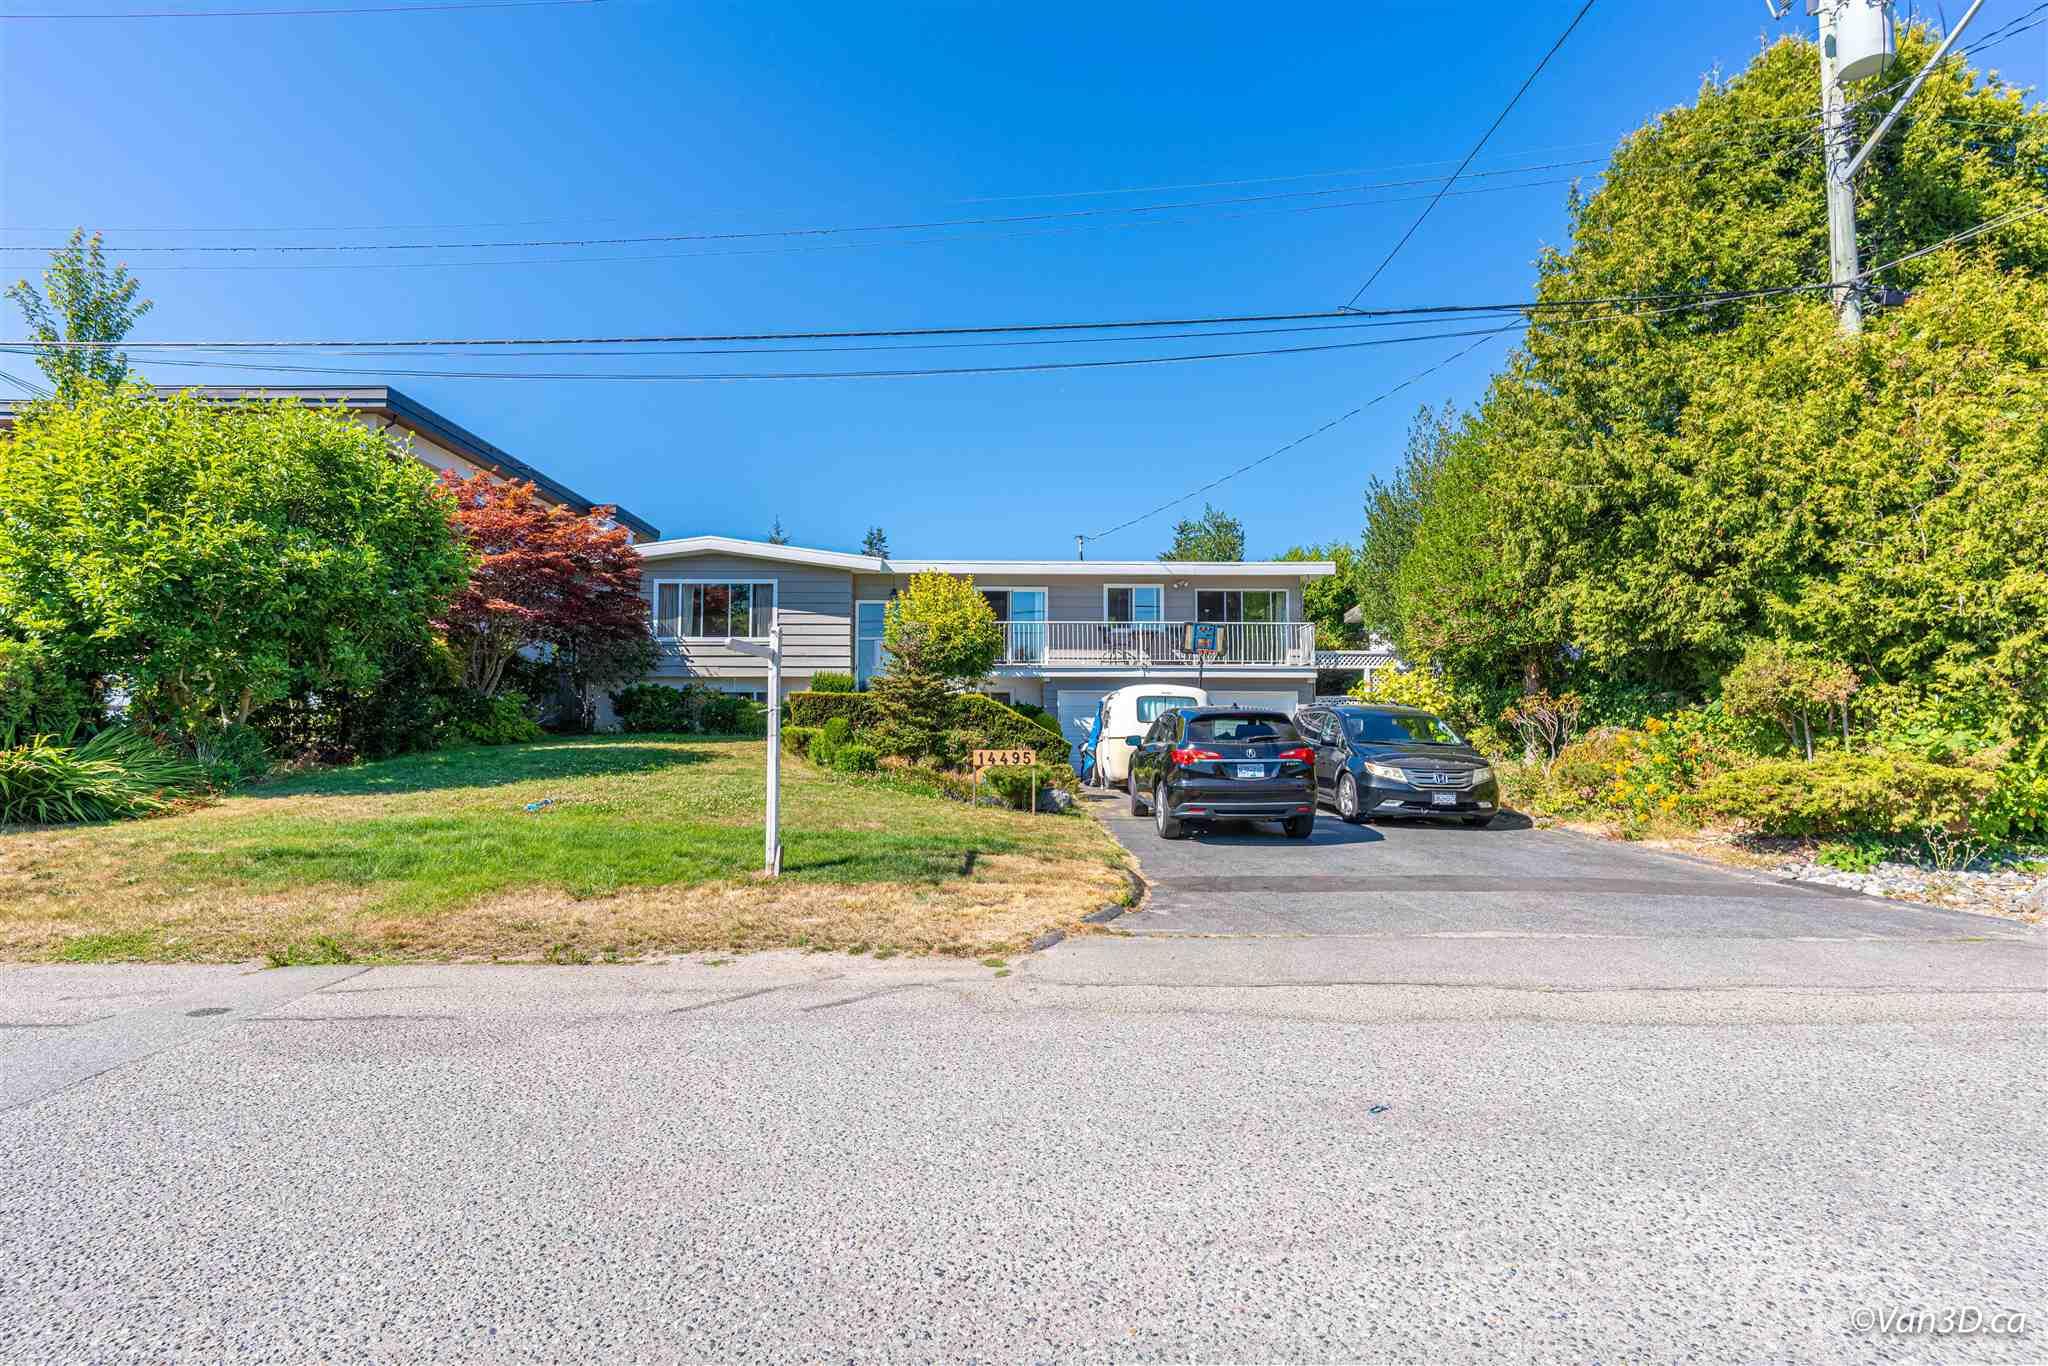 14495 MANN PARK CRESCENT - White Rock House/Single Family for sale, 4 Bedrooms (R2604561) - #37